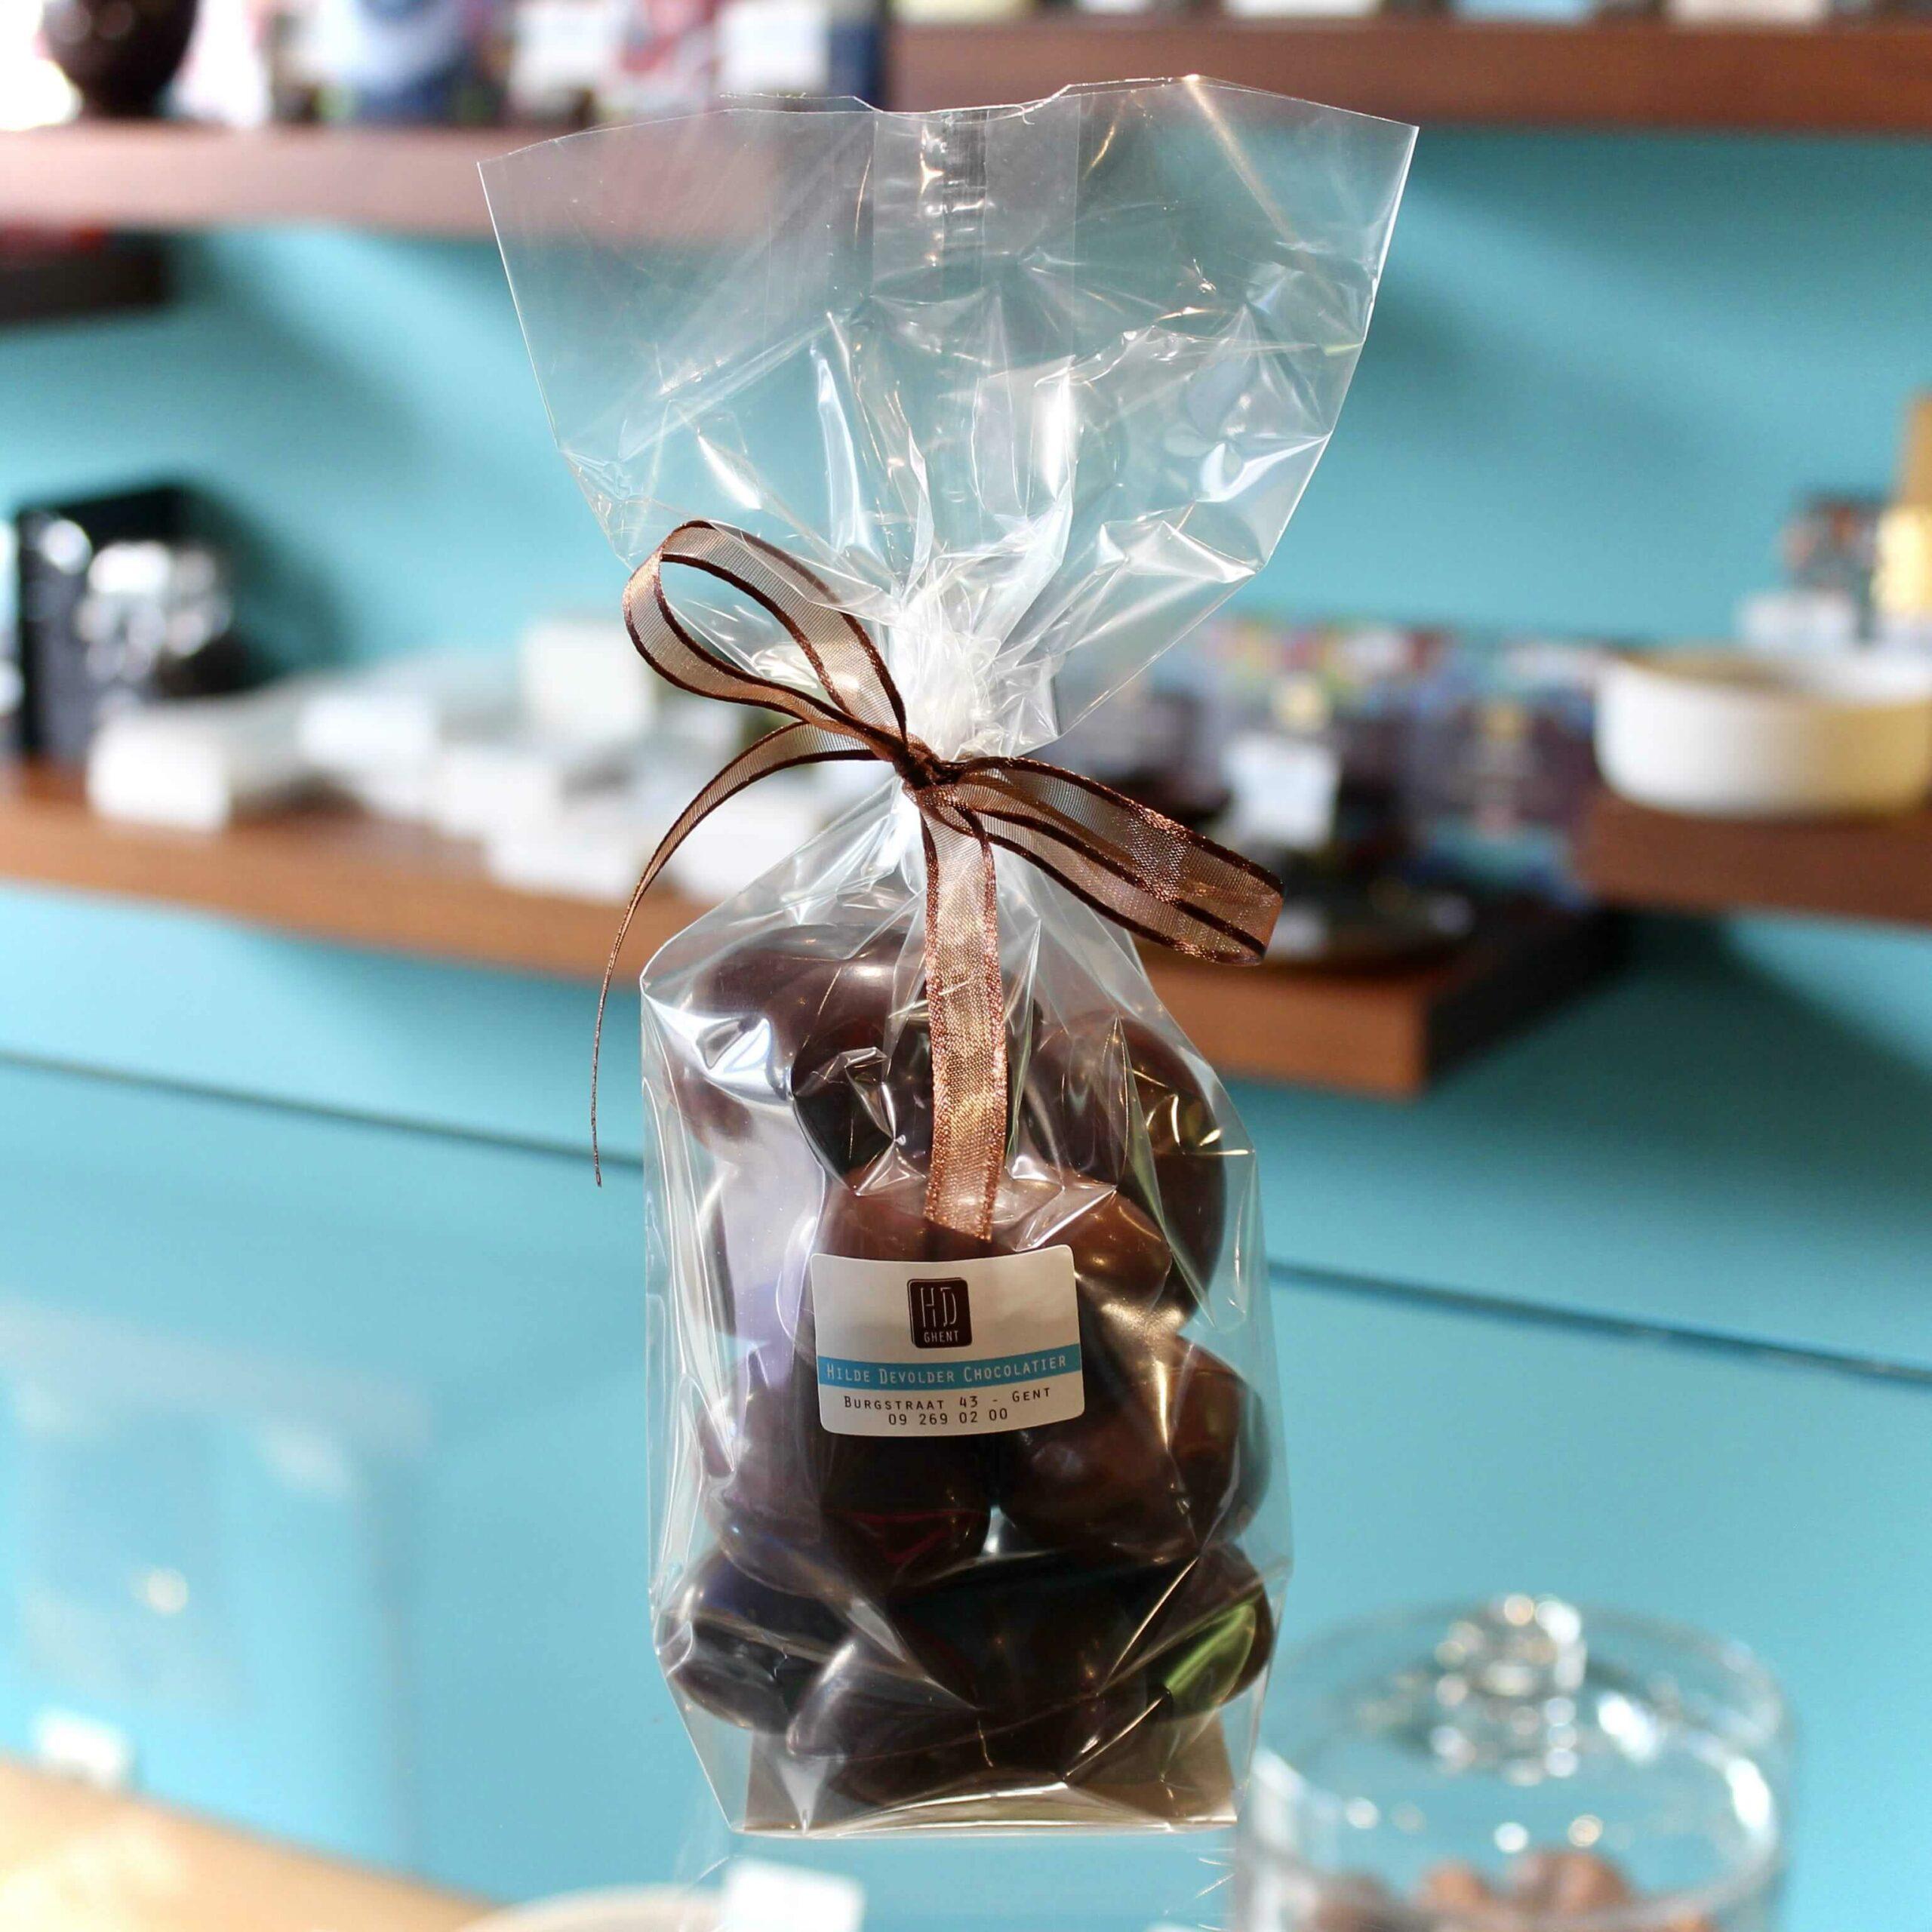 hilde devolder chocolatier easter 2021 hollow easter egg 5 cm dark chocolate